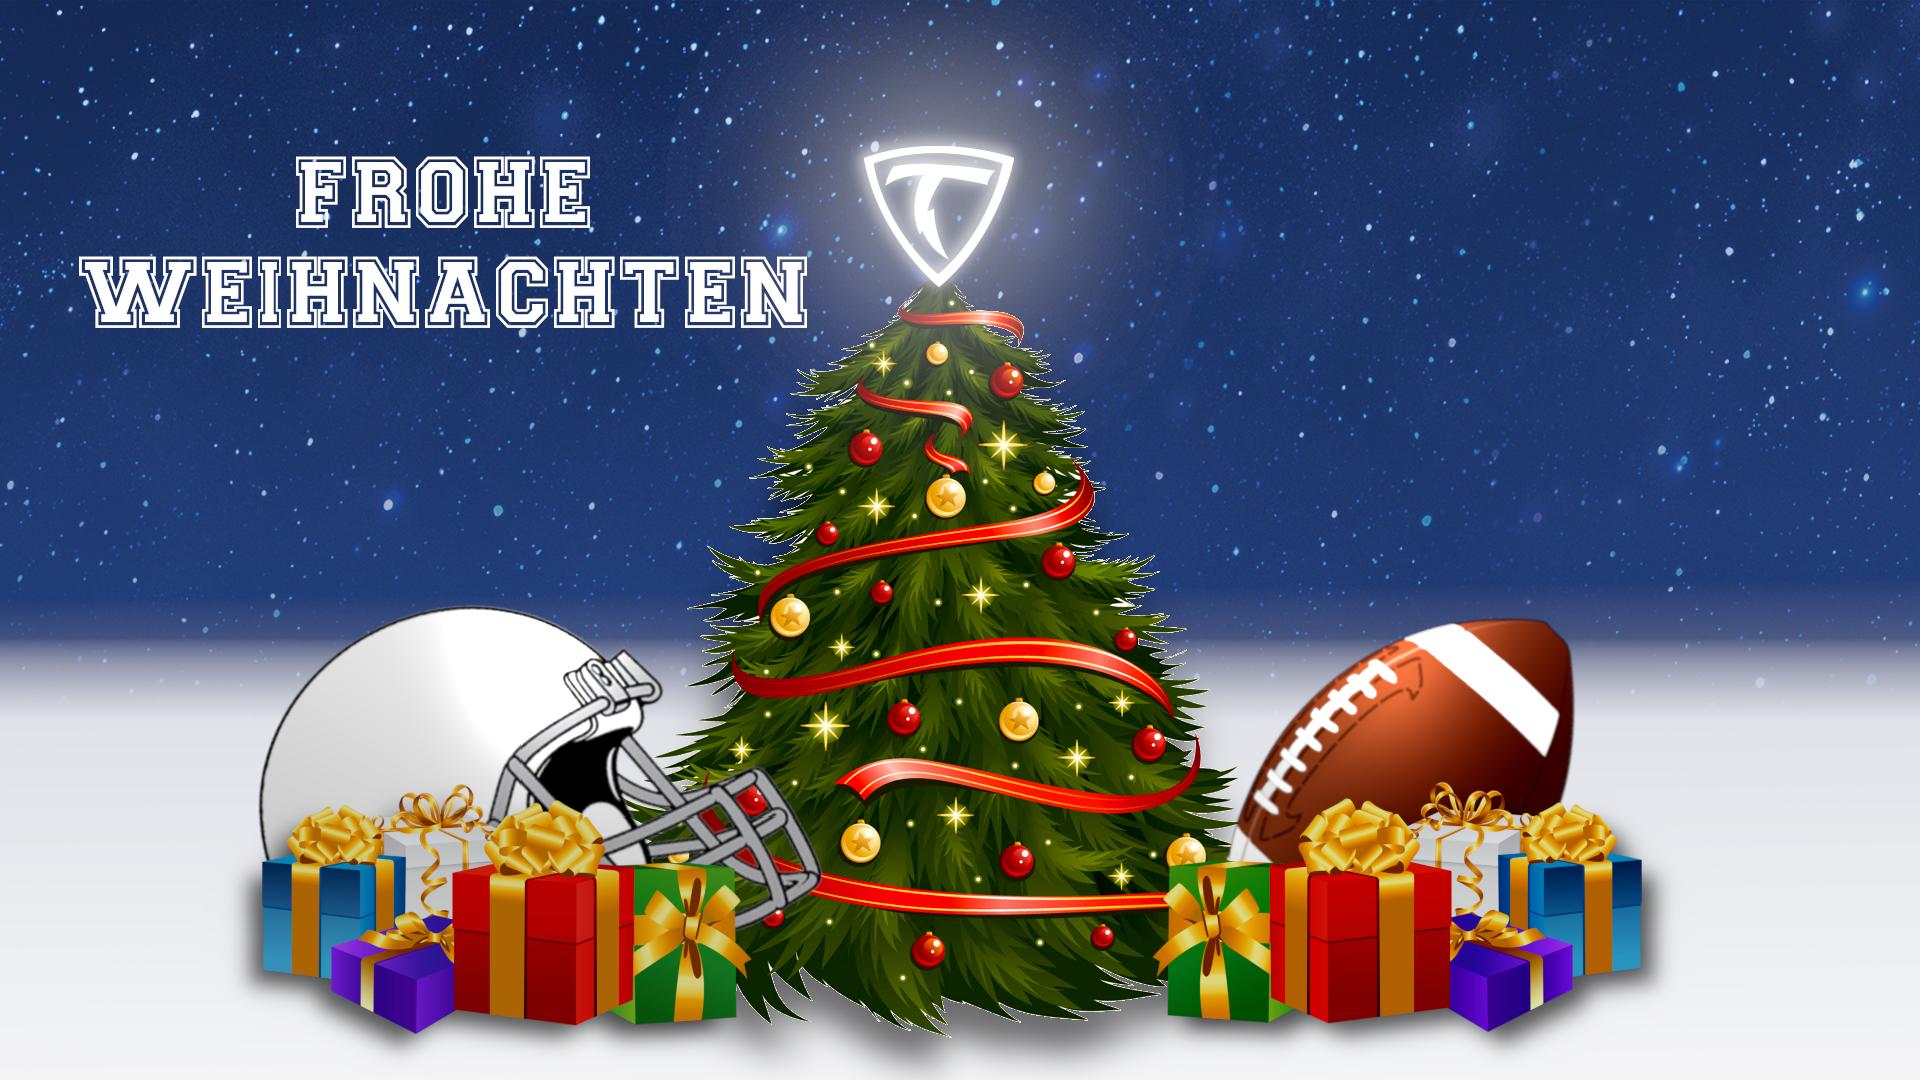 Frohe Weihnachten! Merry Christmas!